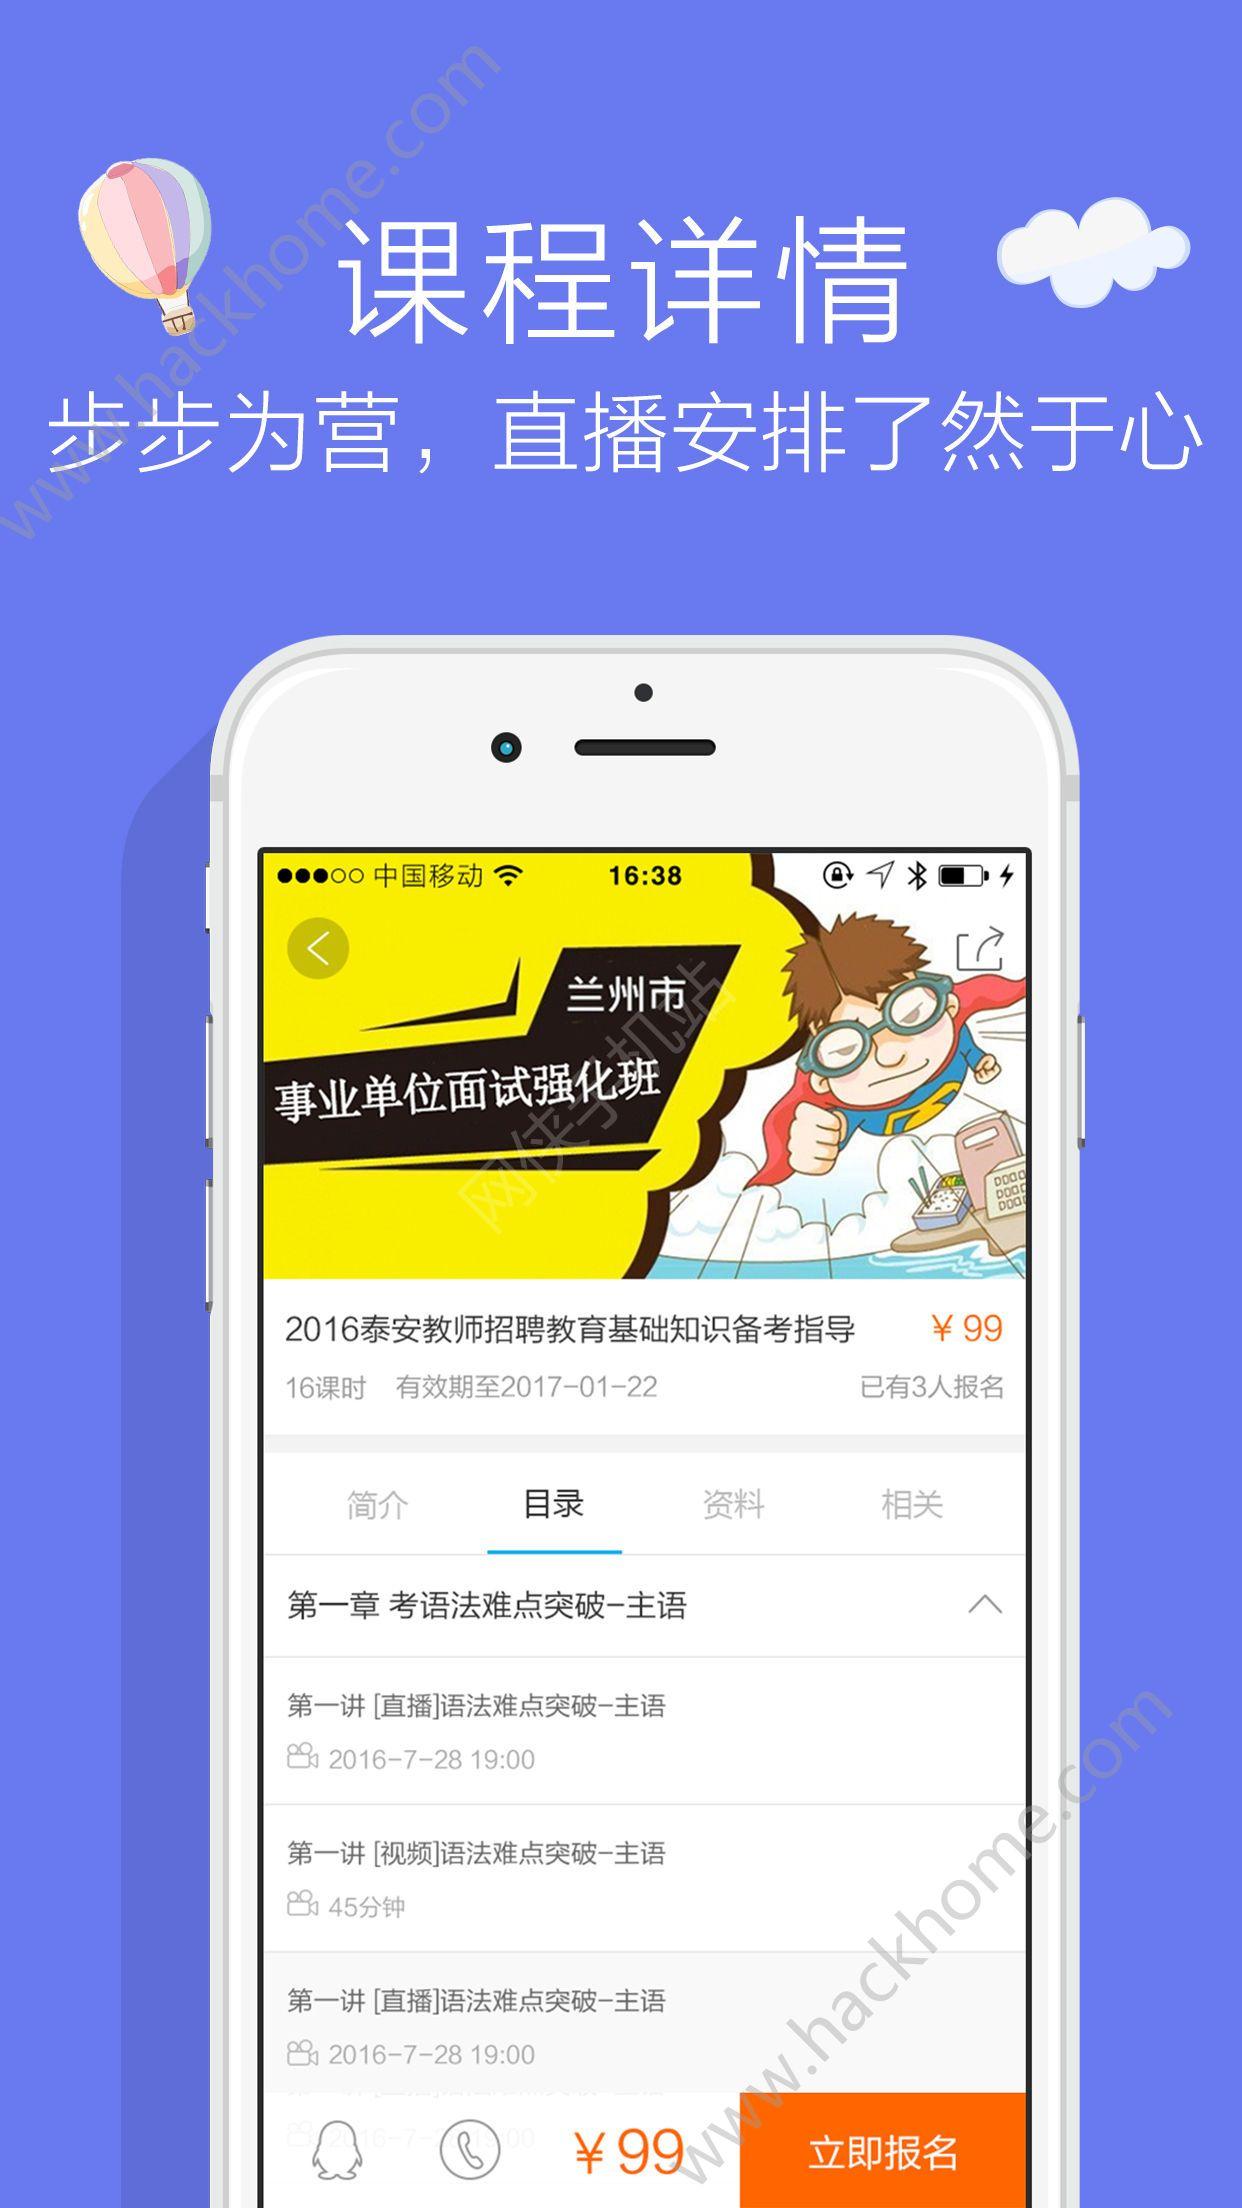 AG娱乐视讯app下载 AG娱乐视讯手机版app客户端下载 v2.7 嗨客安卓软件站